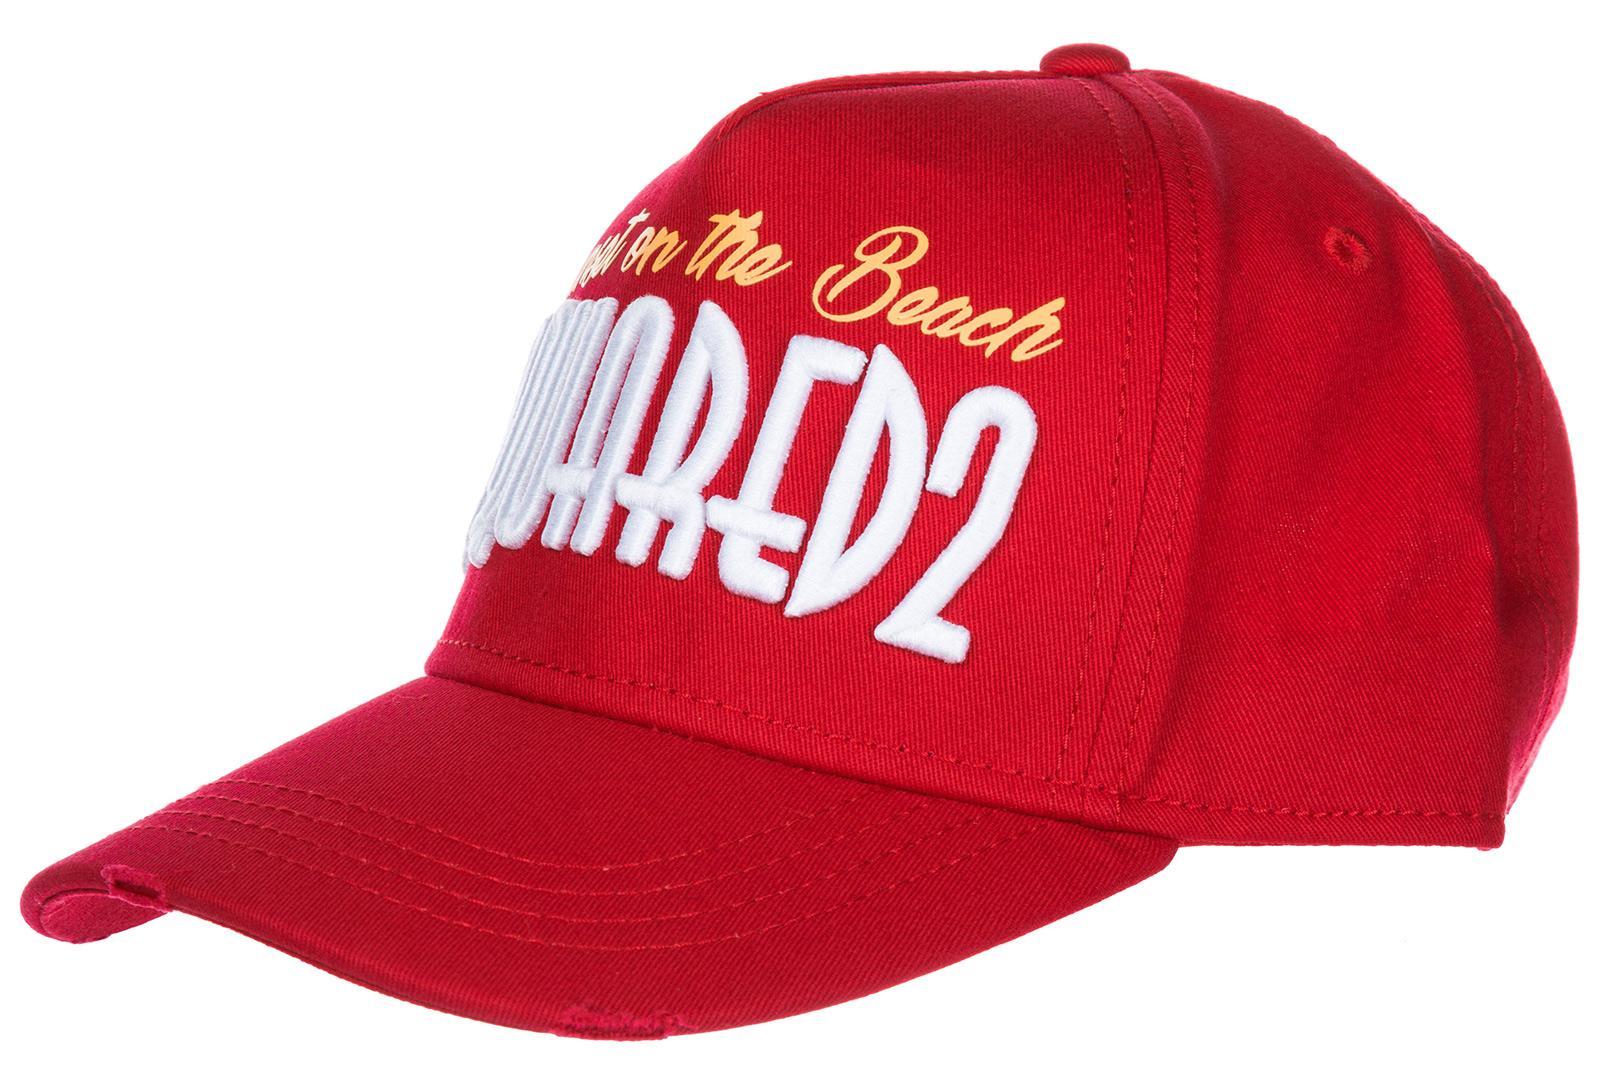 Dsquared2 Adjustable Men's Cotton Hat Baseball Cap Baseball In Red